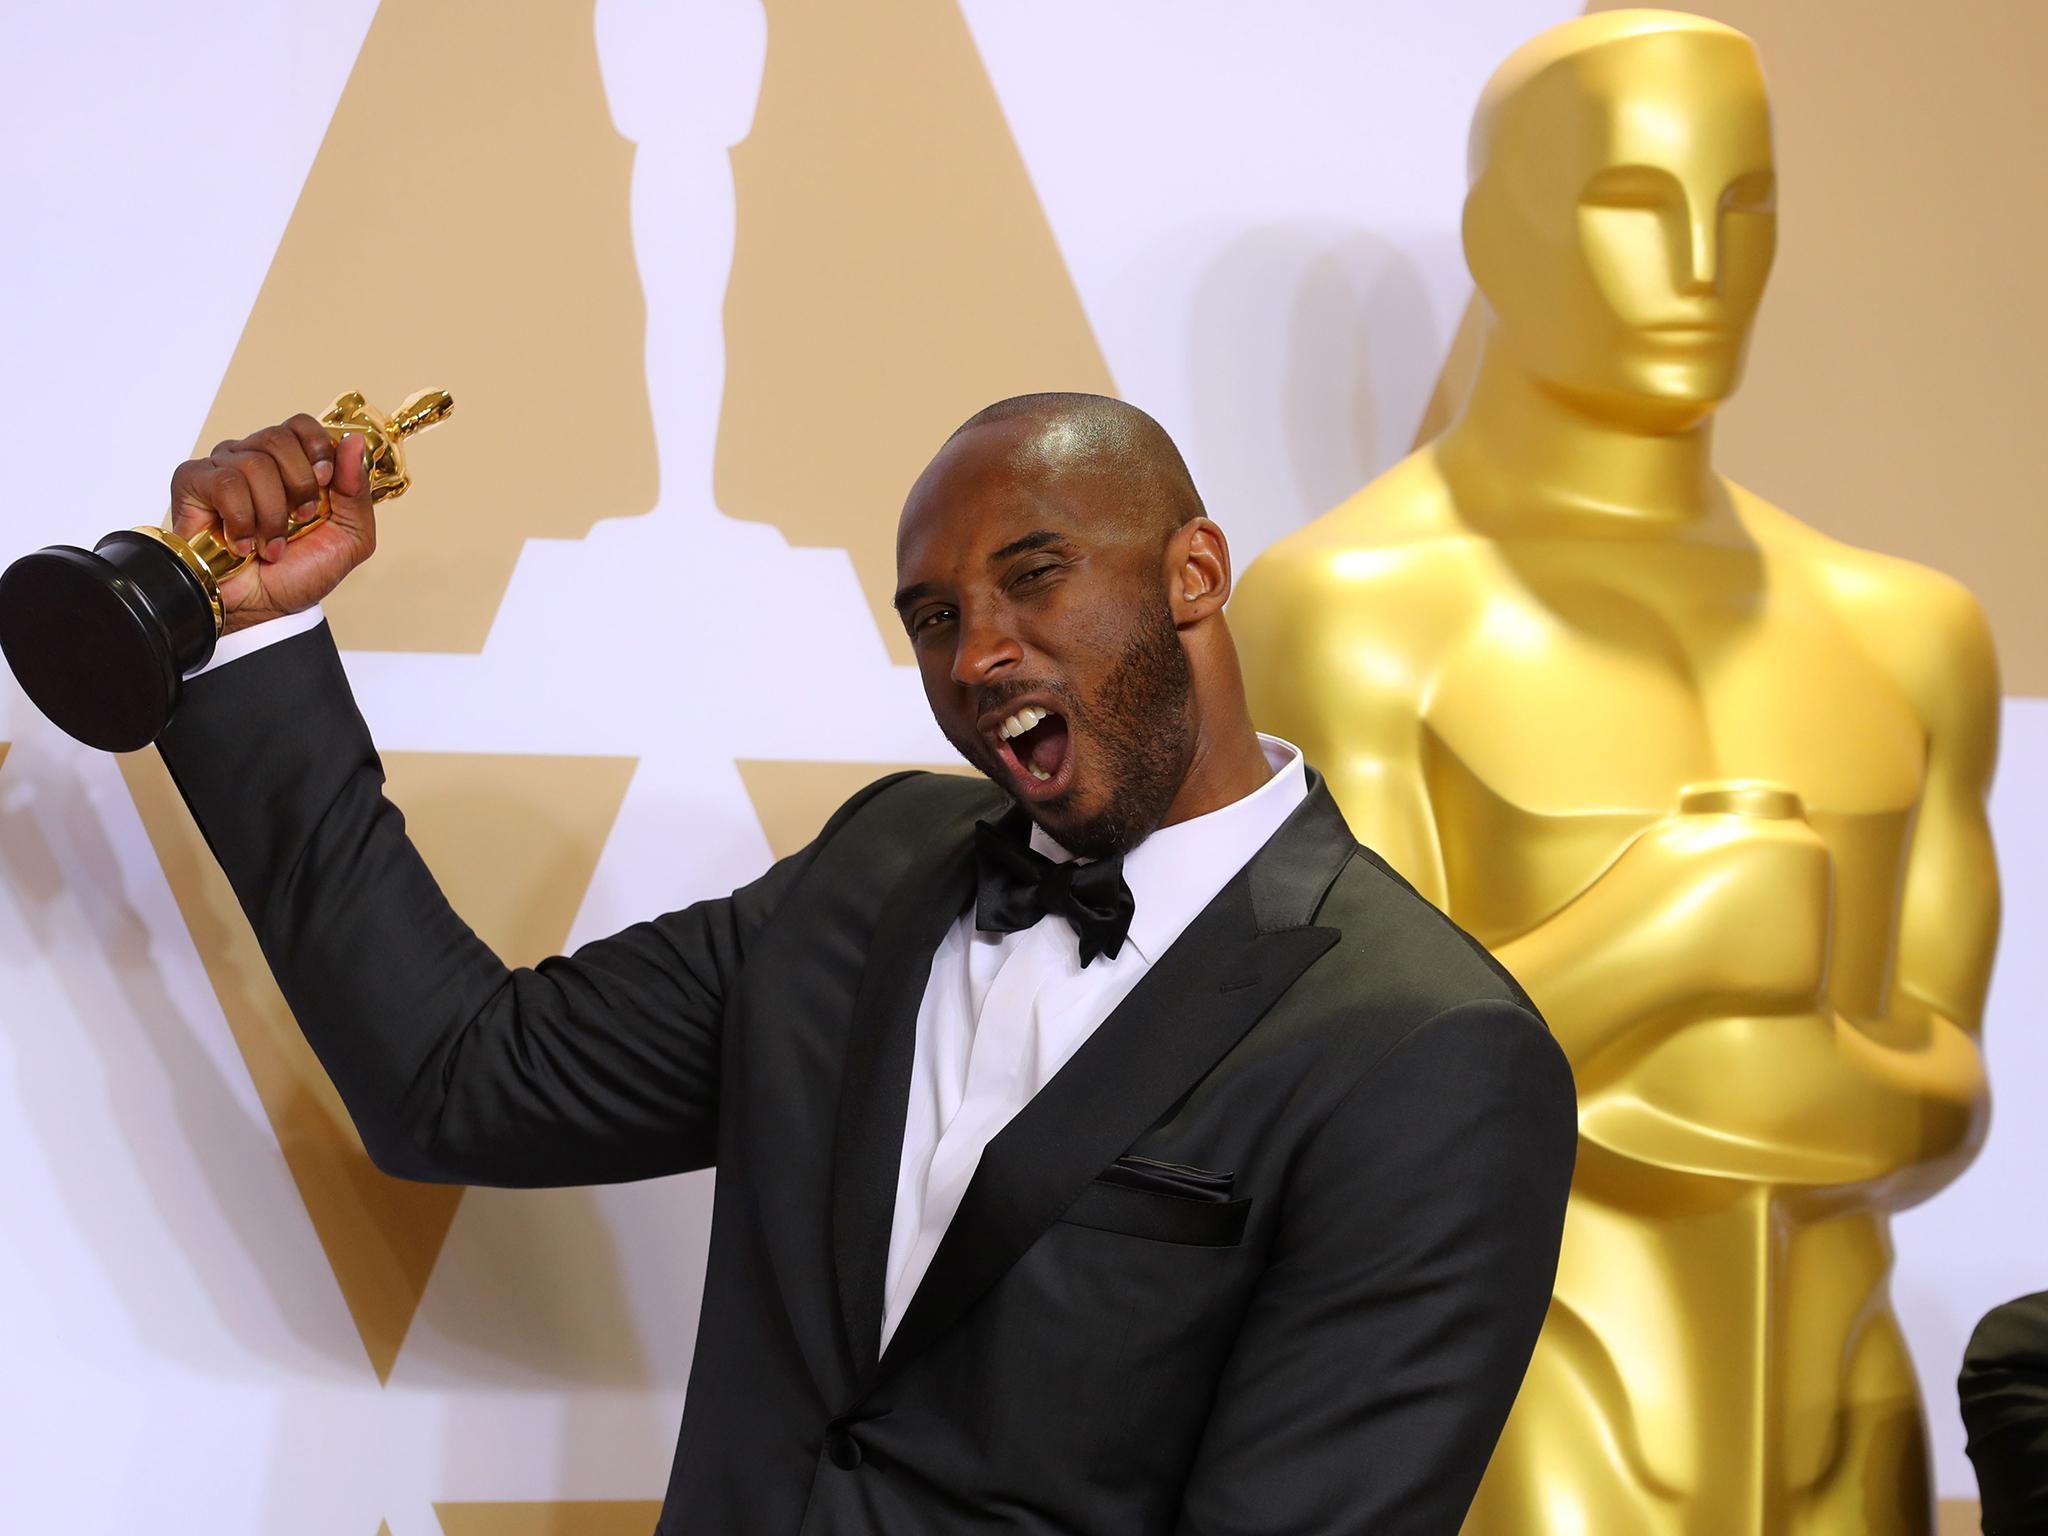 Kobe Bryant's Oscar Will Sit Next To His 5 NBA Championships